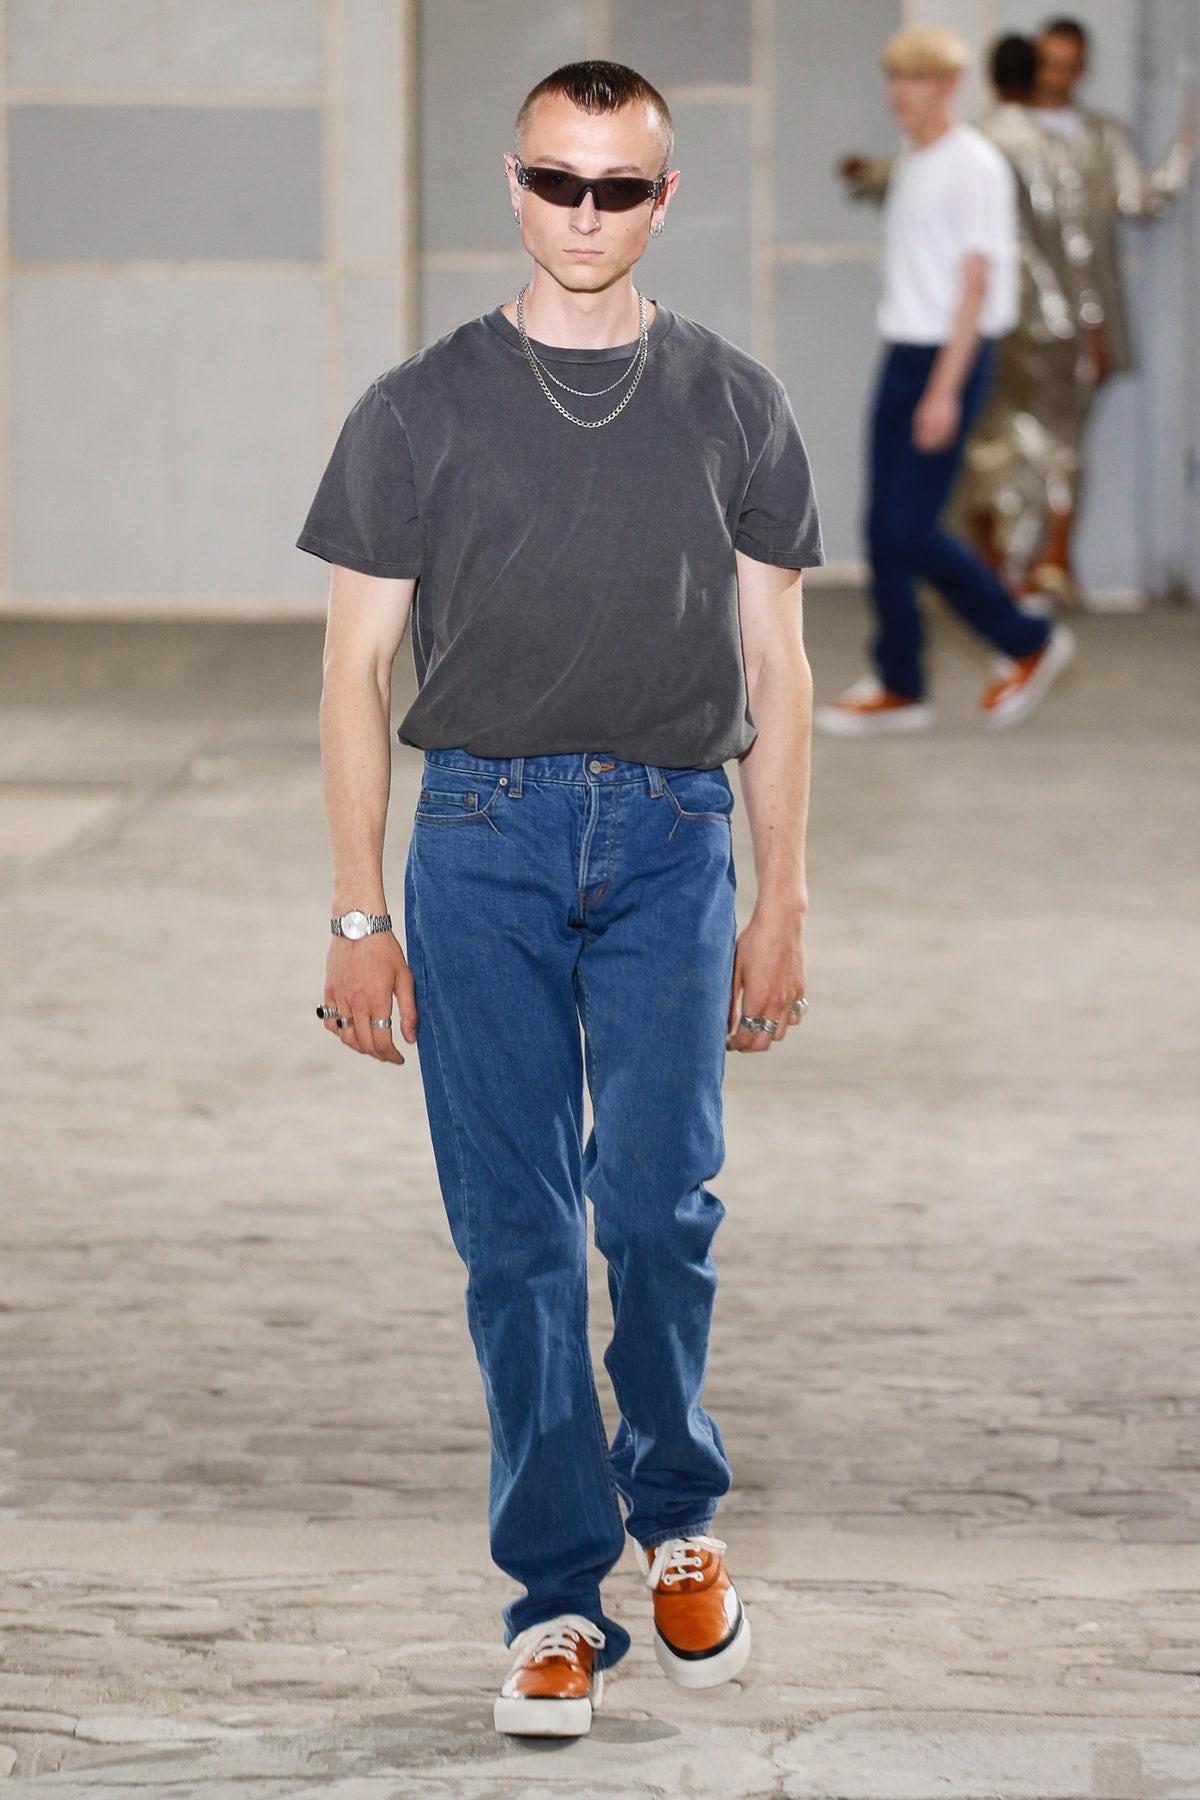 Julien David Explores Simplicity